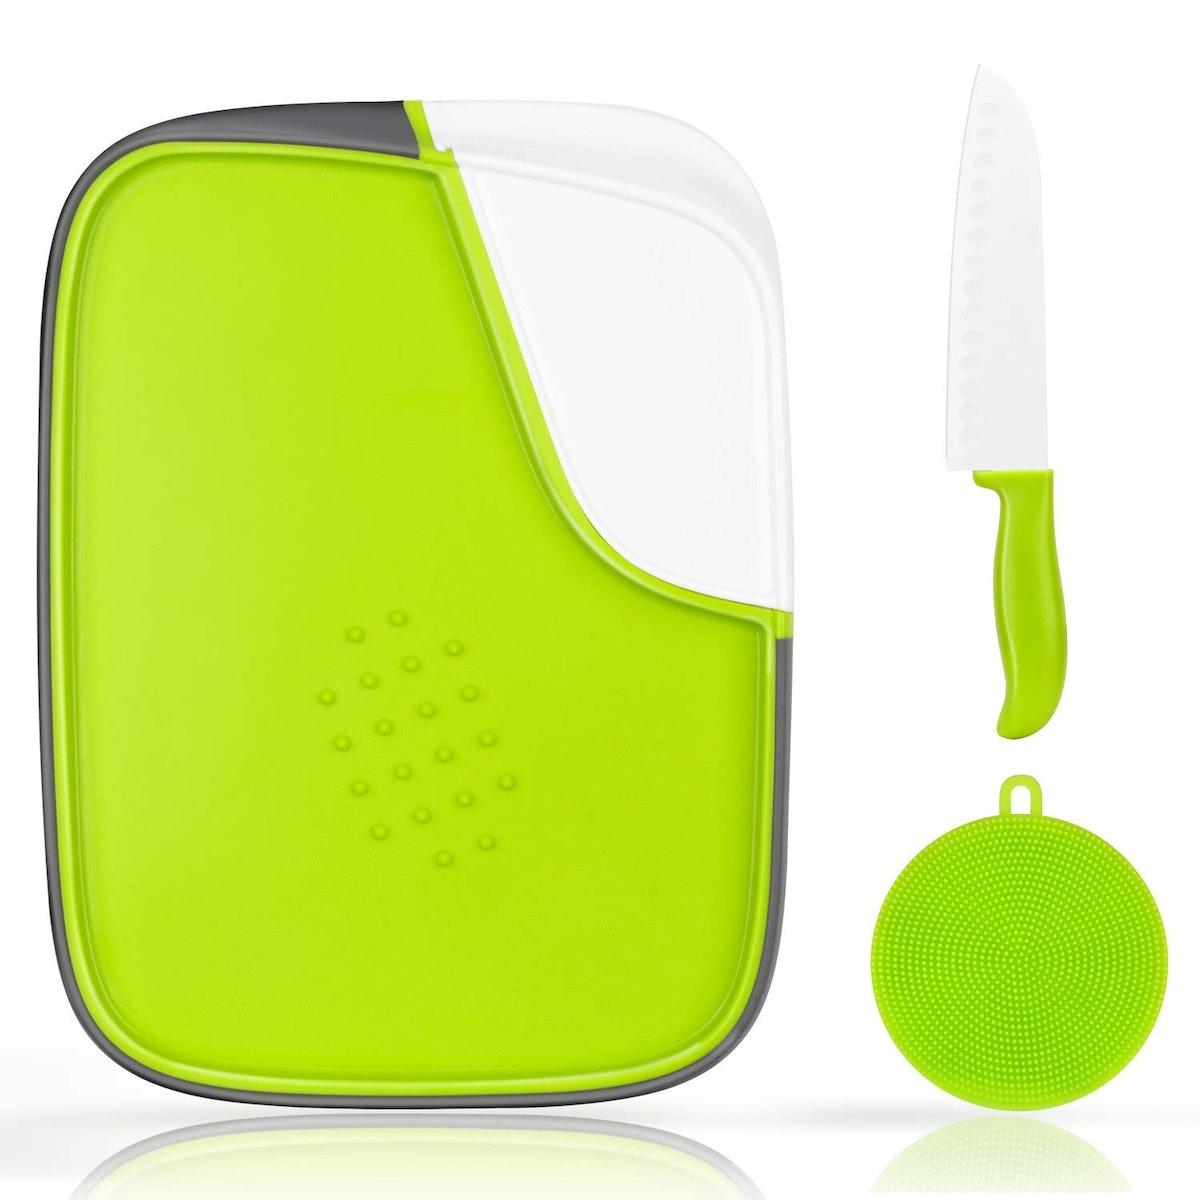 Wahcaak Plastic Cutting Board Set